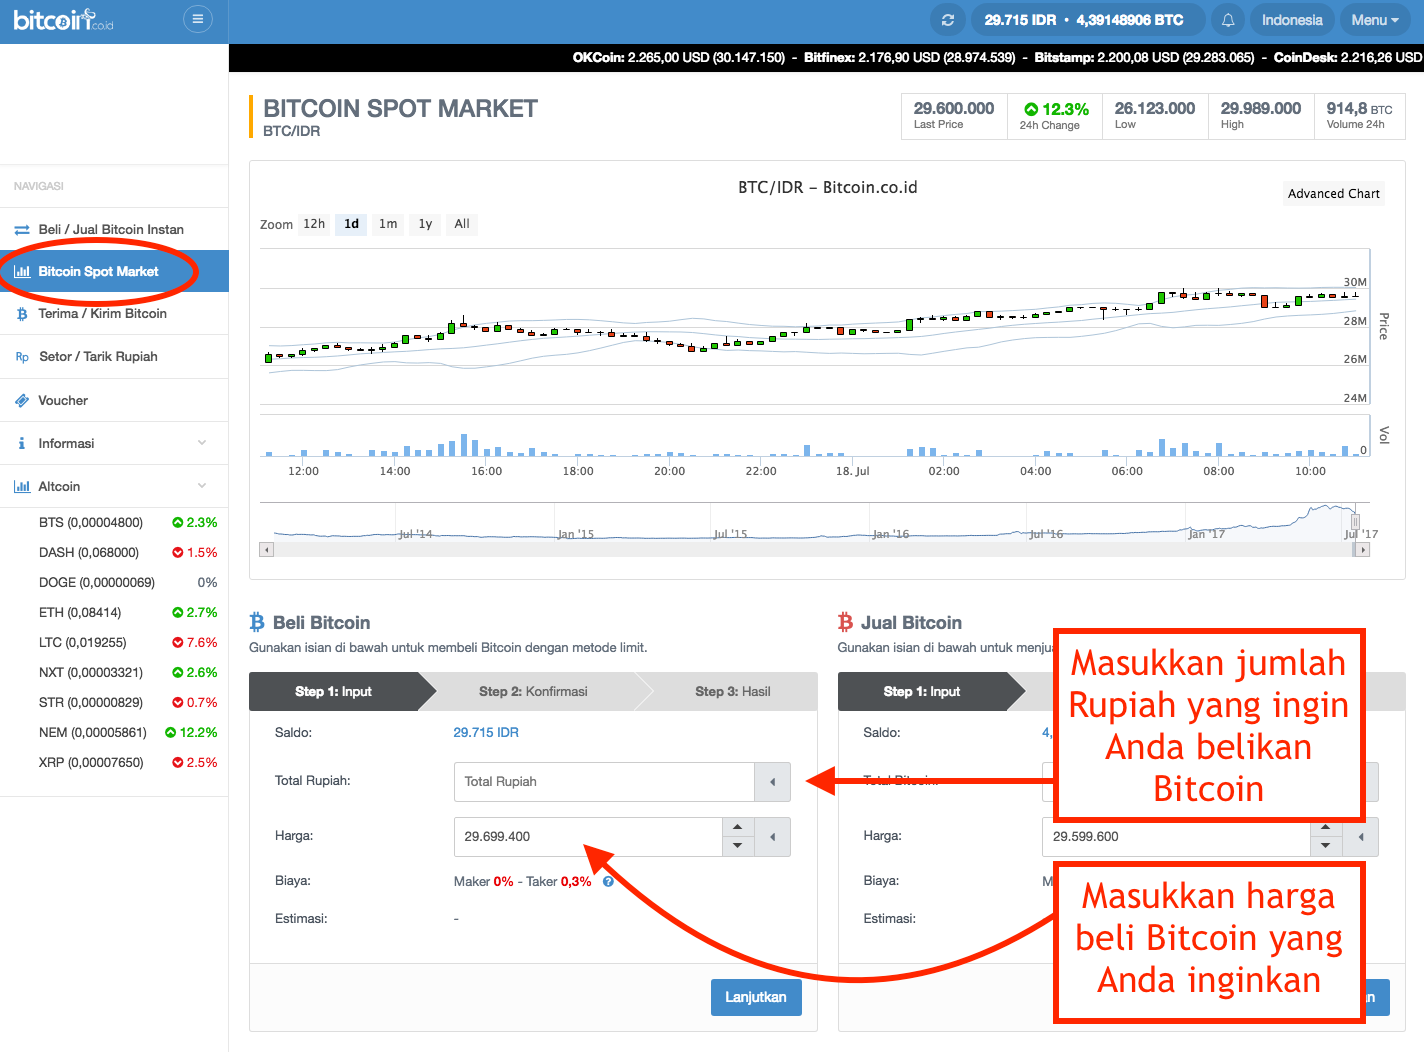 Trading,jual,beli,bitcoin